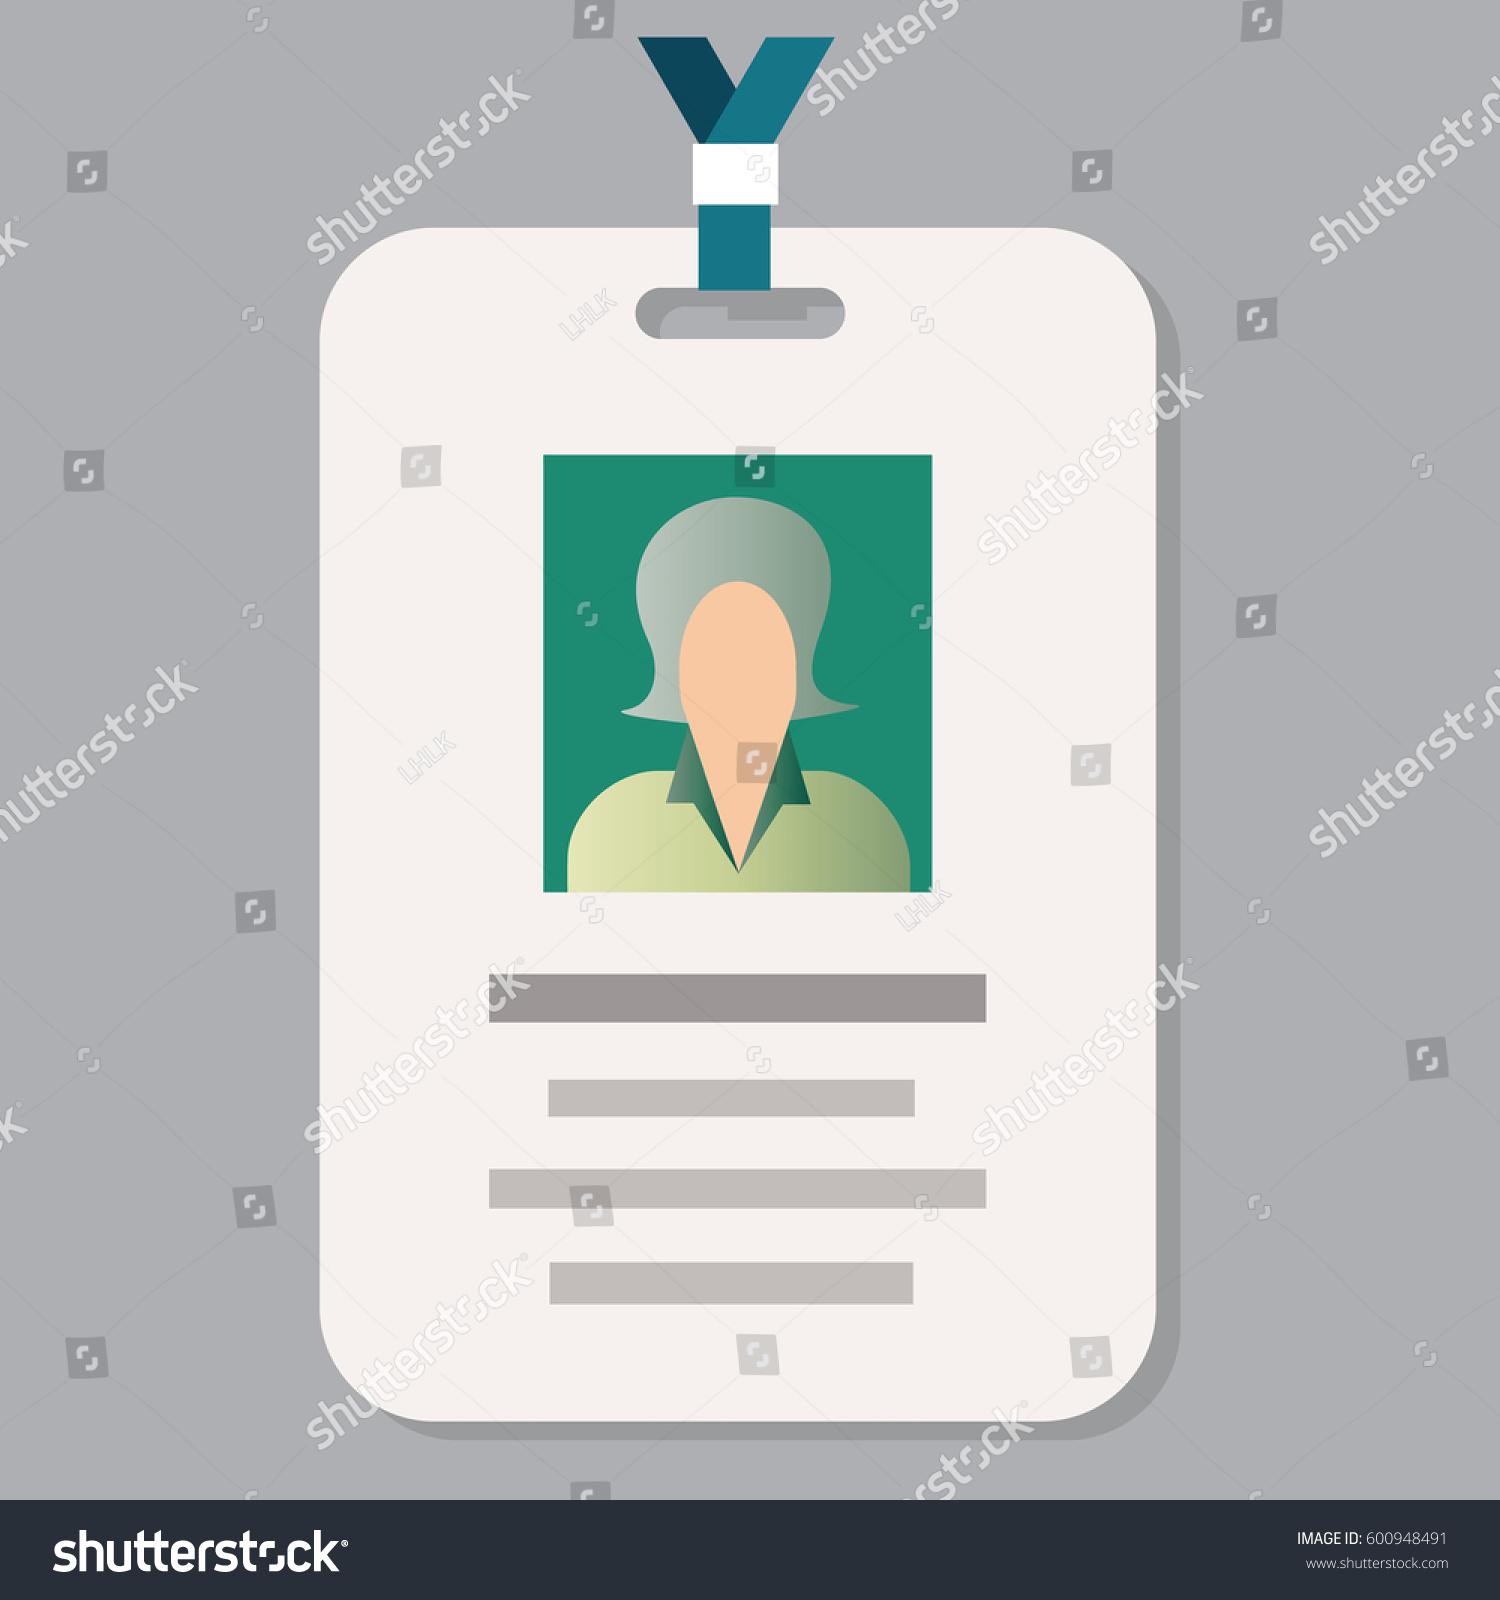 ID aggancio badge AAF sito di incontri